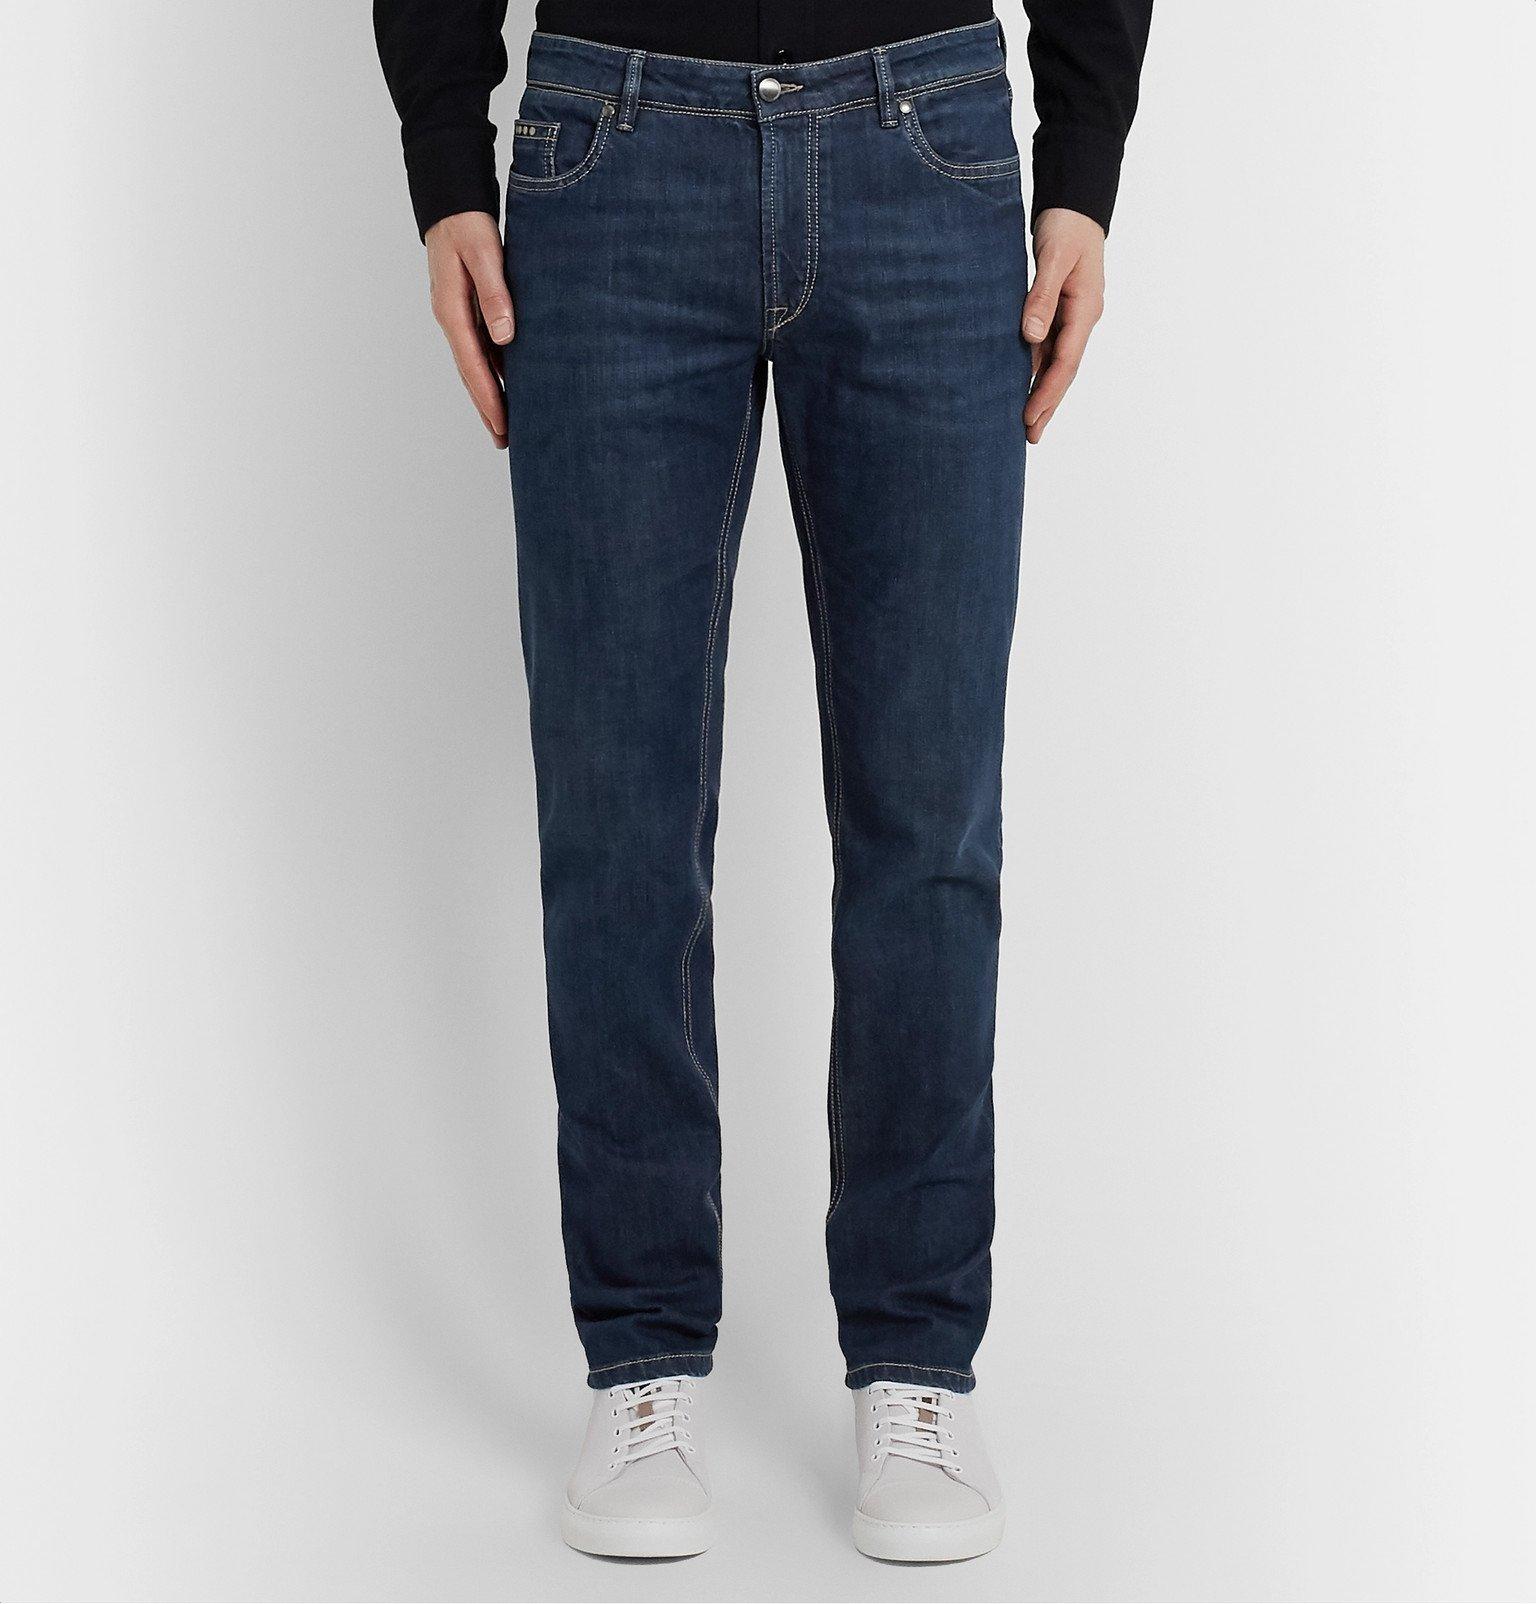 Tod's - Slim-Fit Stretch-Denim Jeans - Blue